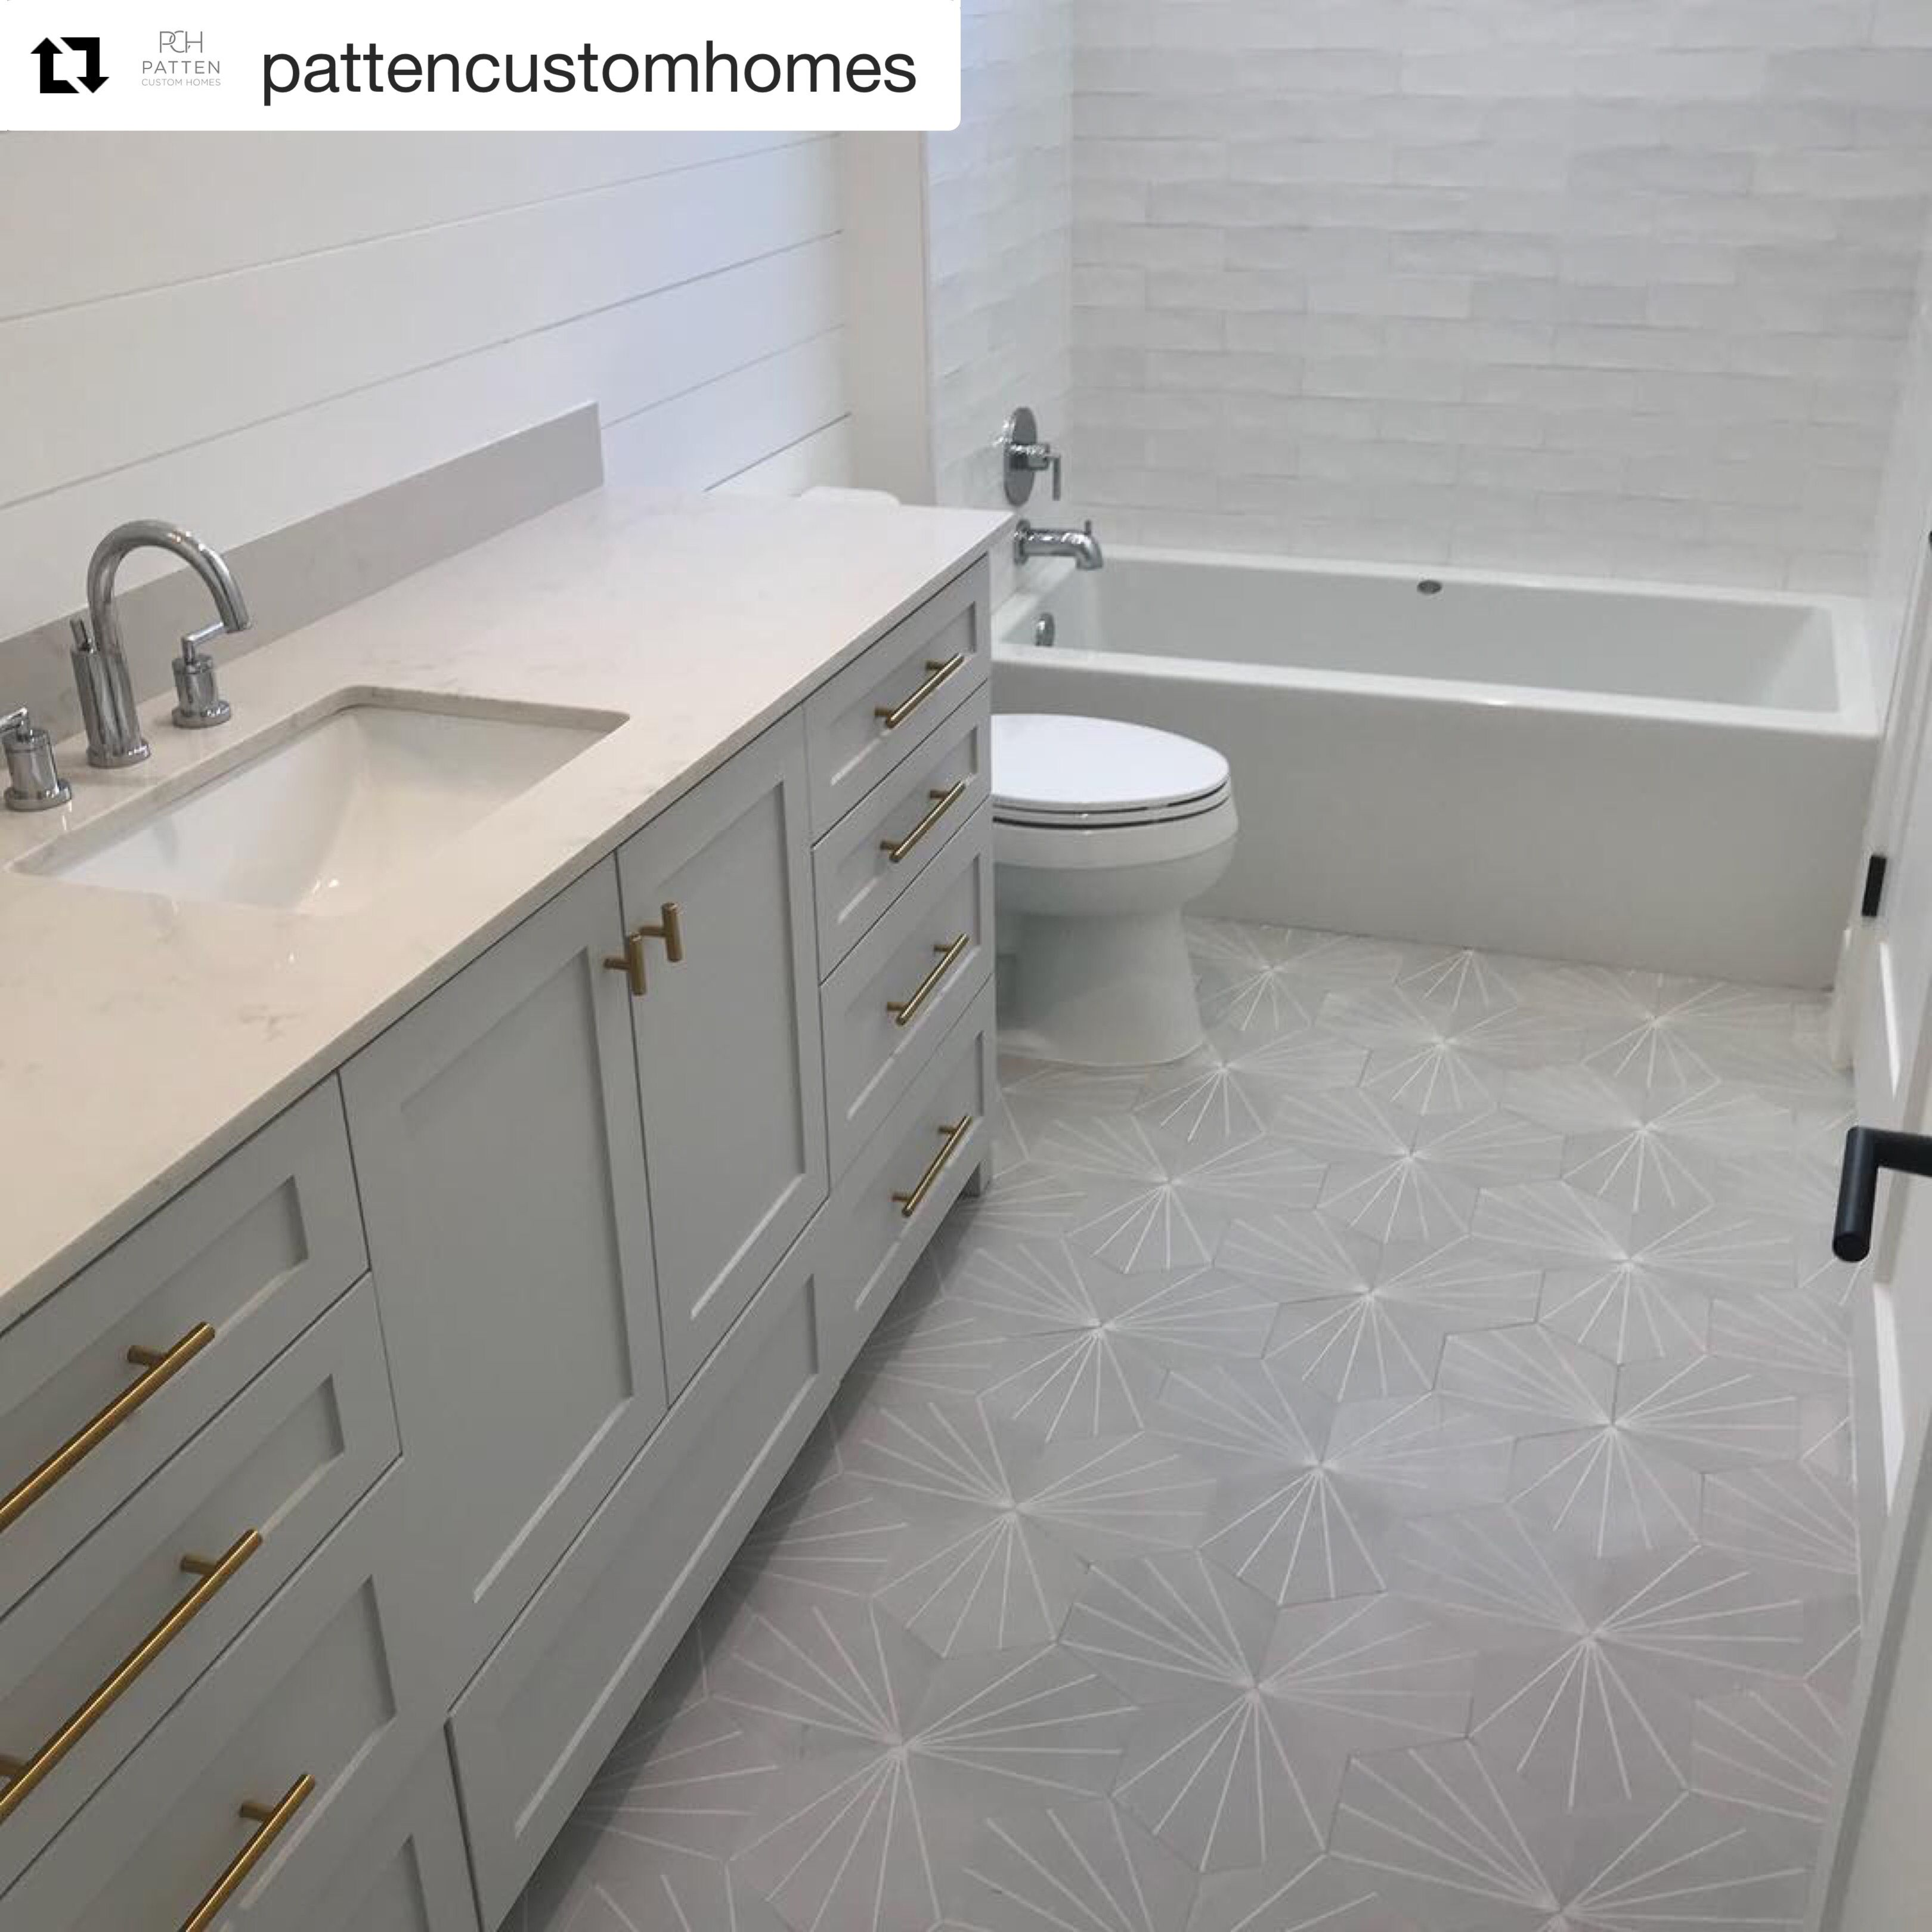 Nola Grey Geometric Tile Cement Tile Riad Tile Patterned Bathroom Tiles Grey Bathroom Floor Cement Tiles Bathroom